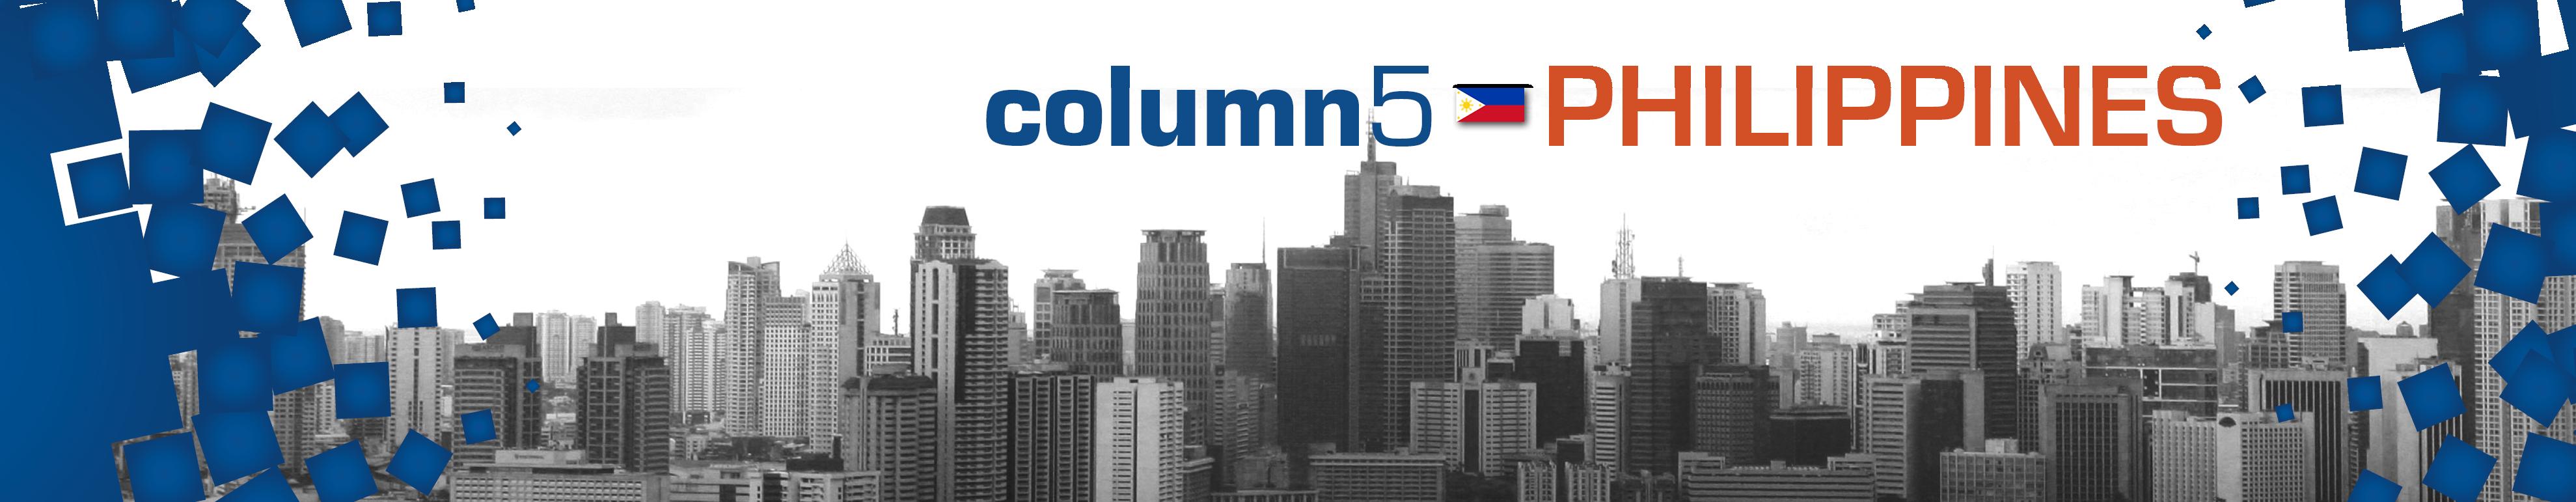 Column5 Philippines